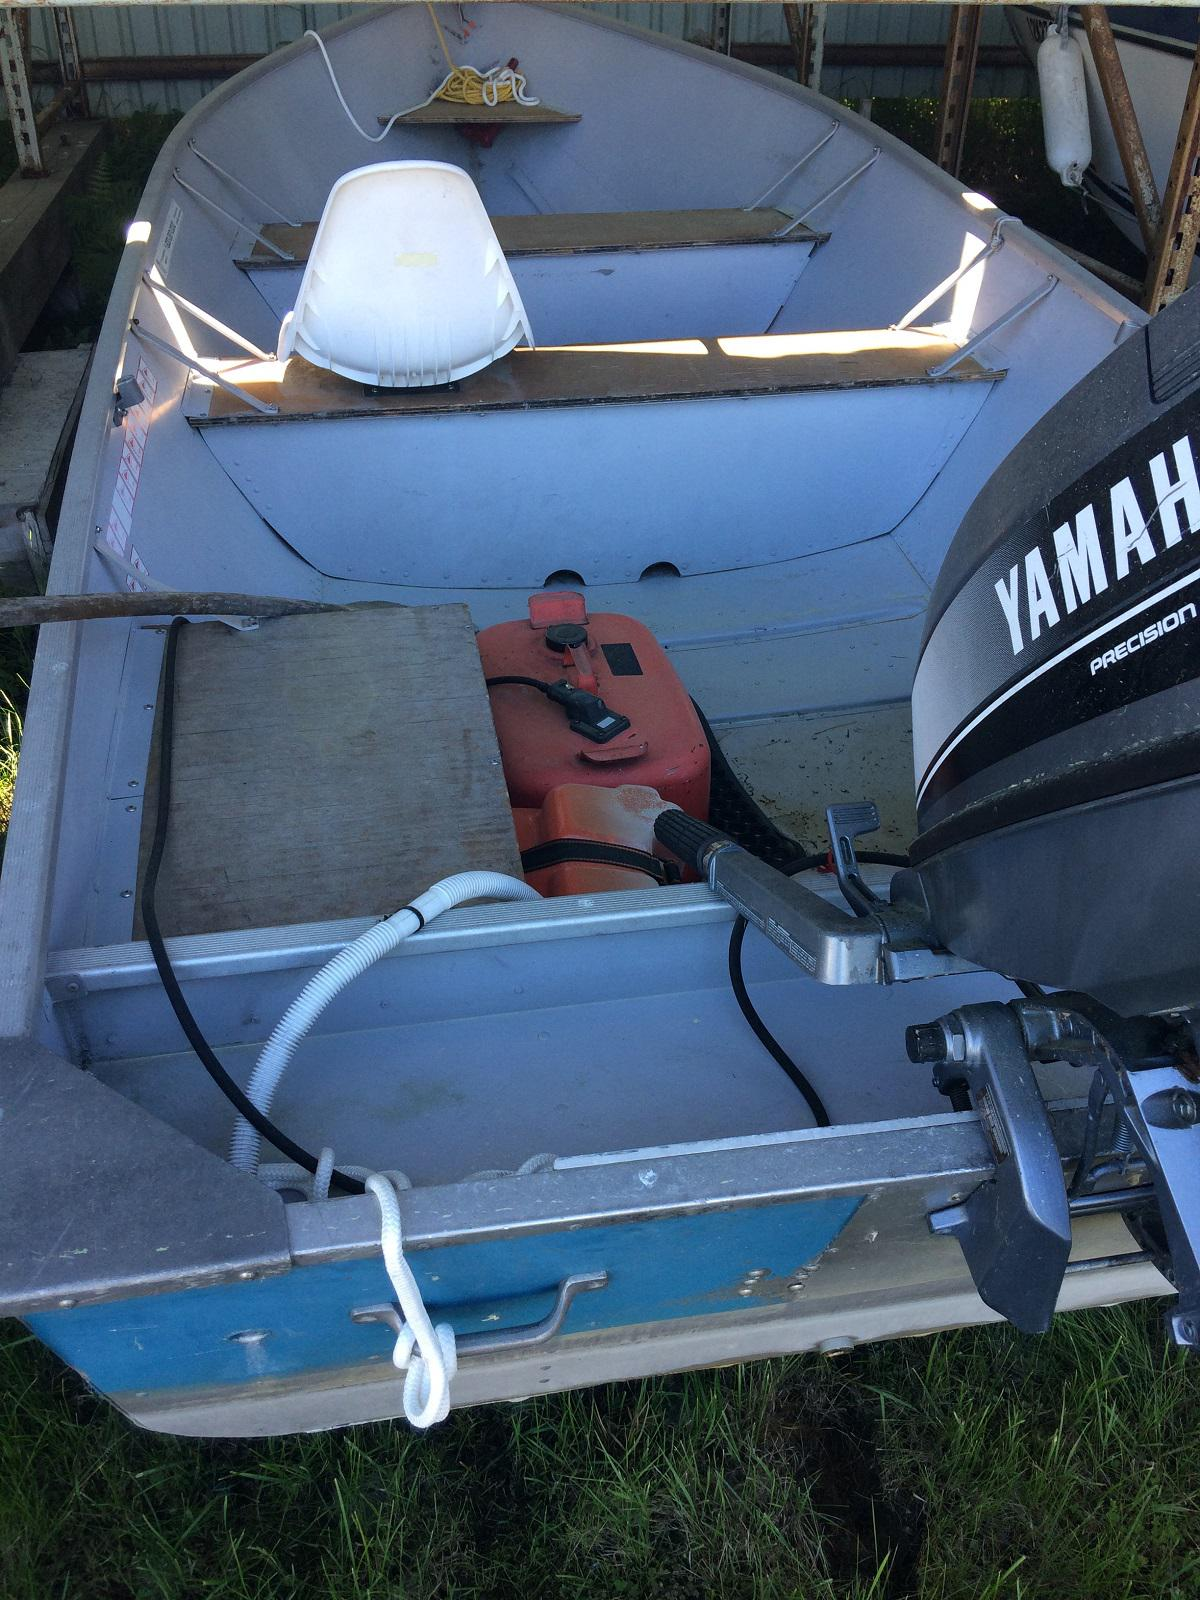 Boat Rentals Payne Marine Ltd  Pointe au Baril, ON (705) 366